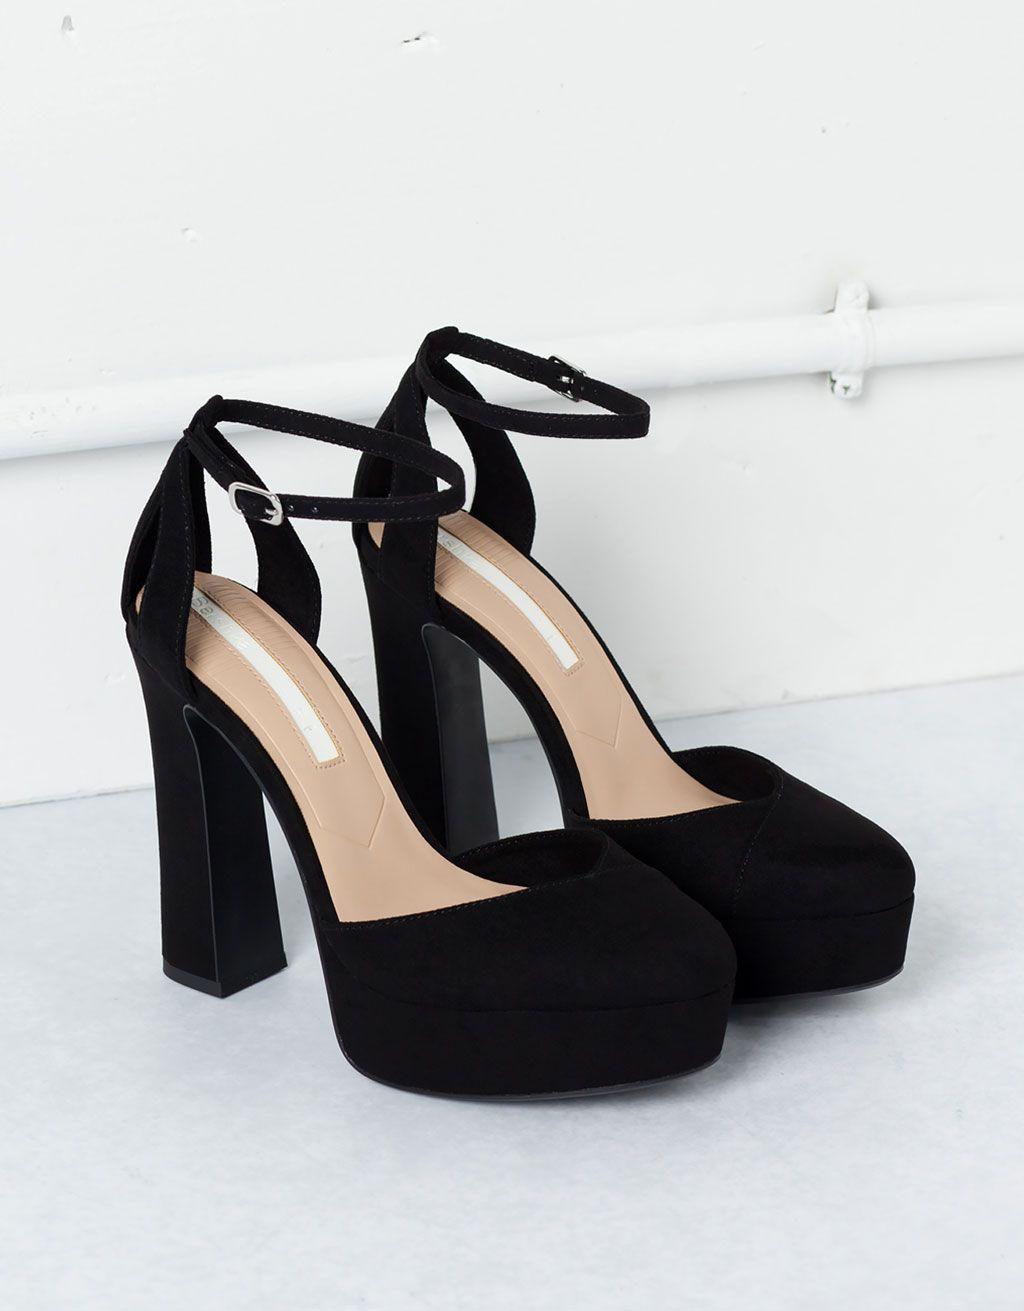 Escarpins plateforme Bershka - Chaussures à talons - Bershka France